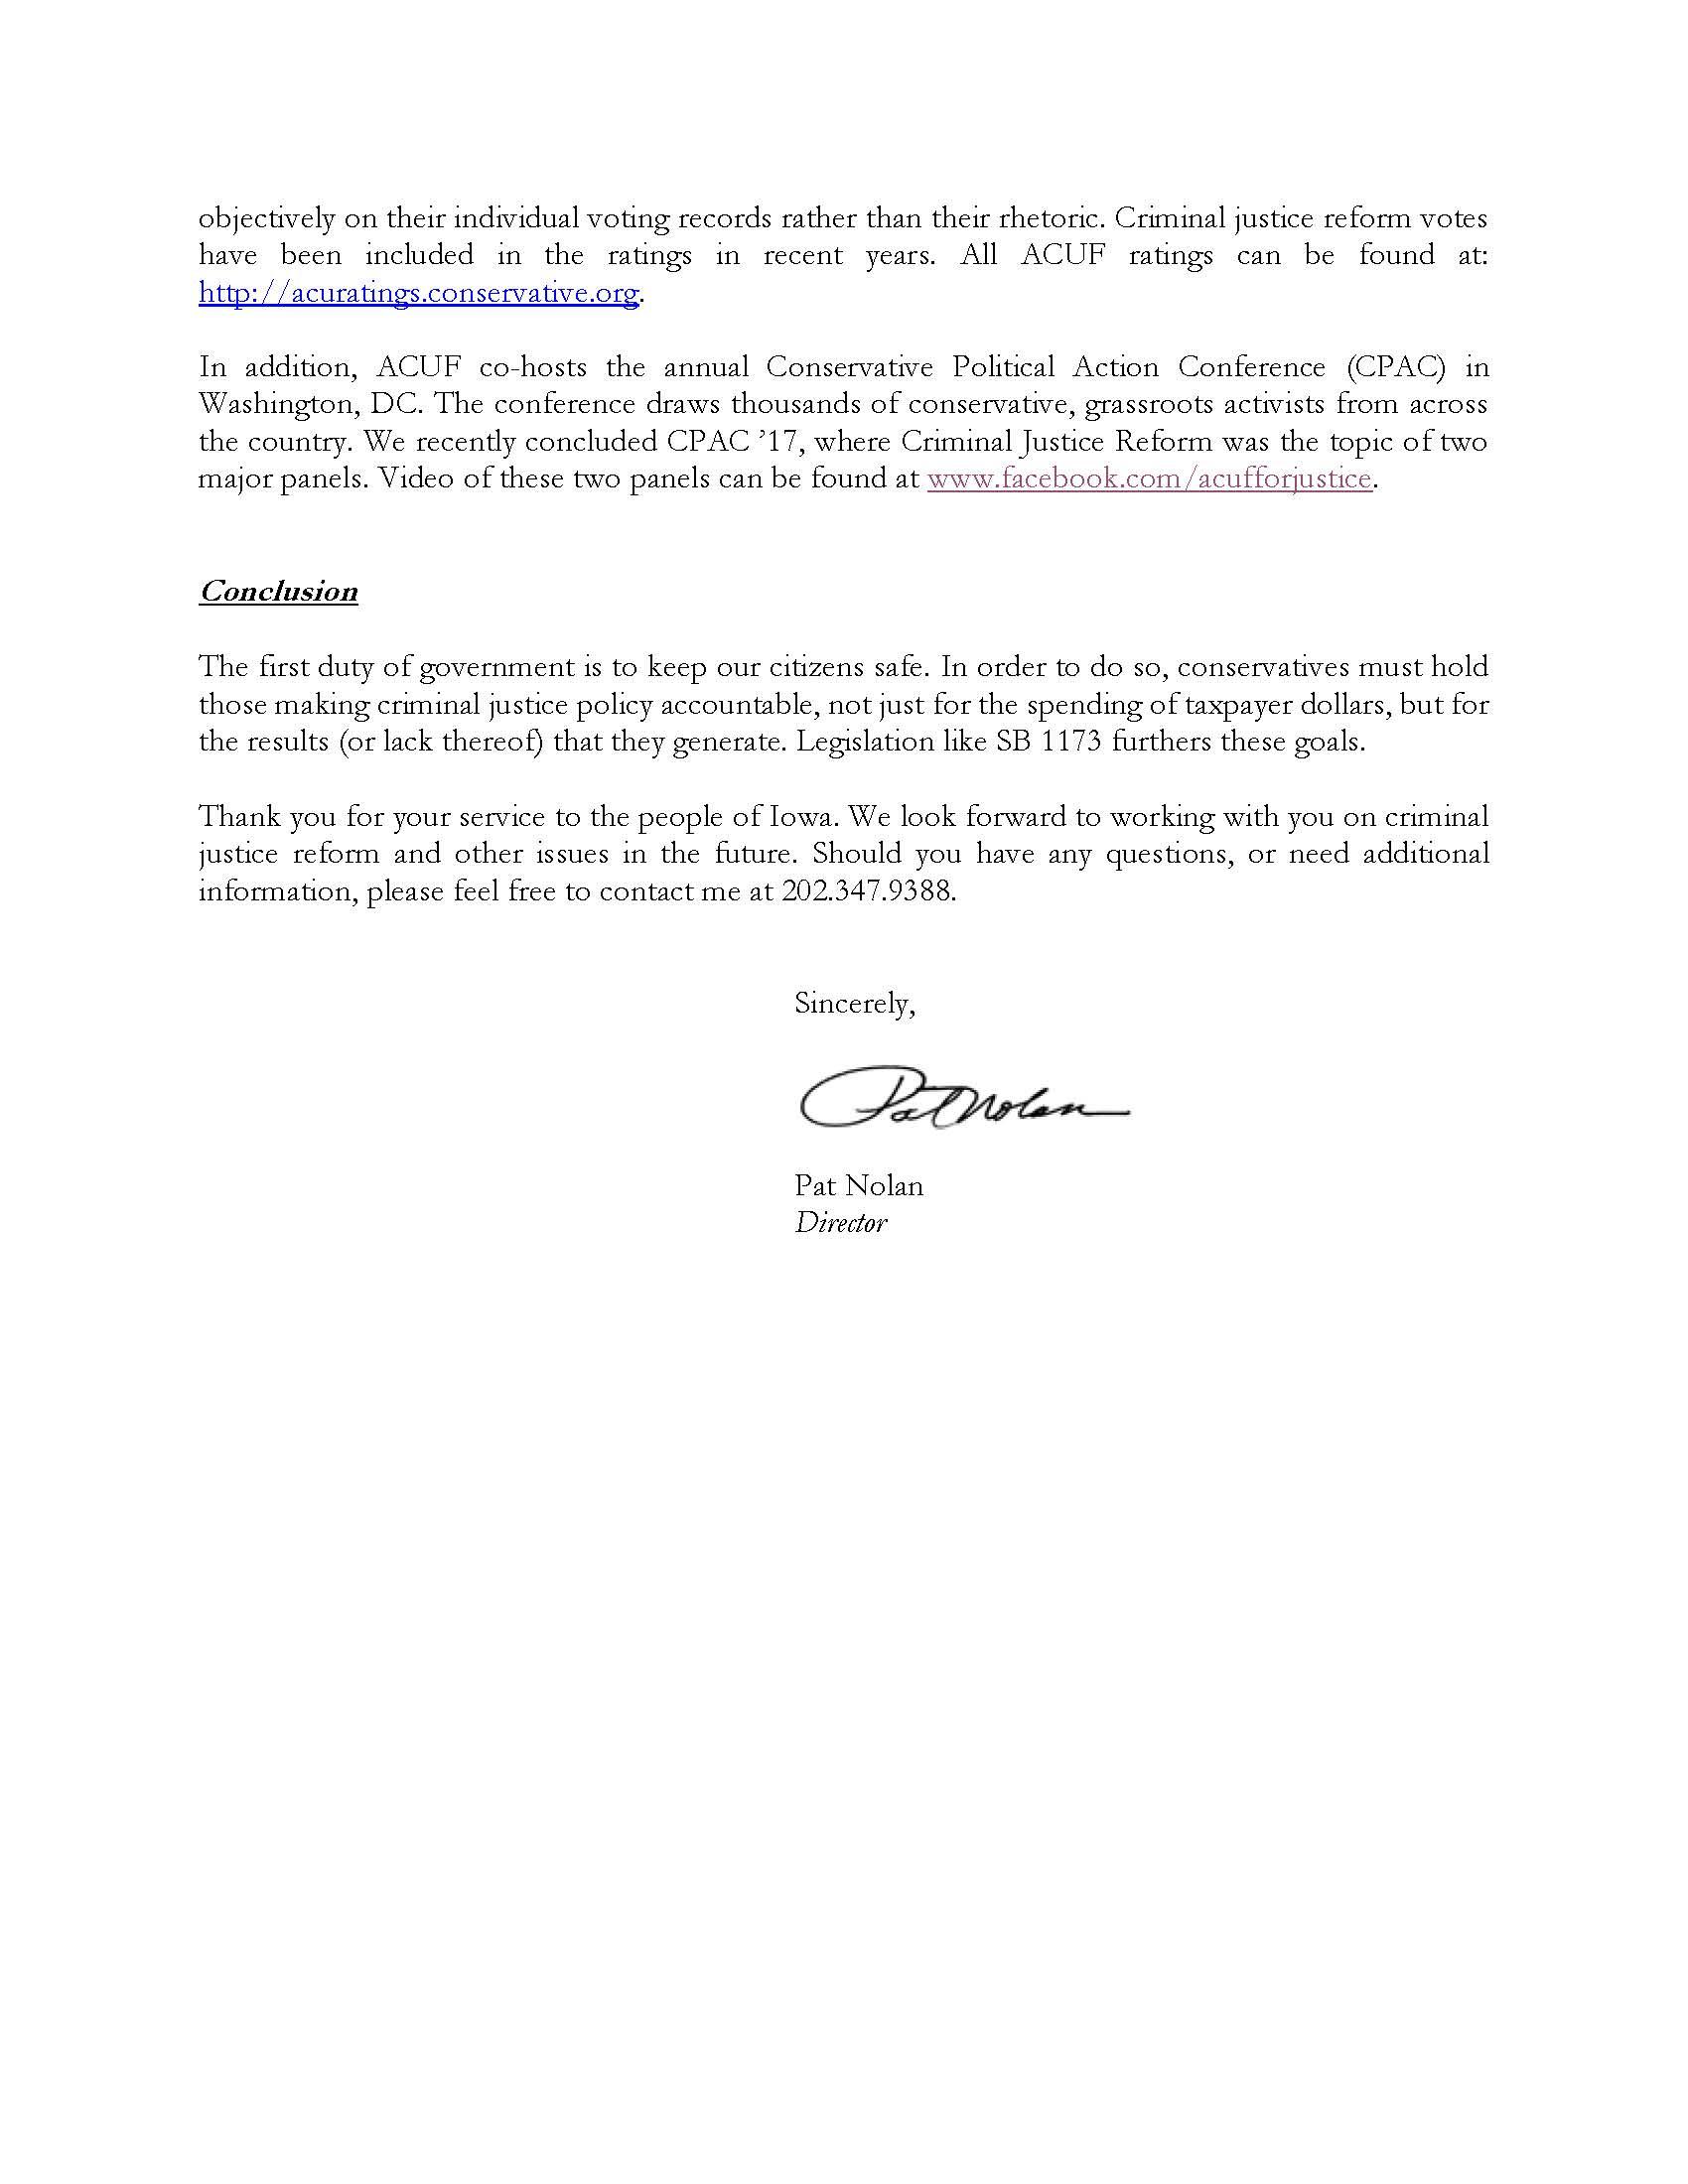 2017_Iowa_SB1173_Legislature_Letter_Page_2.jpg